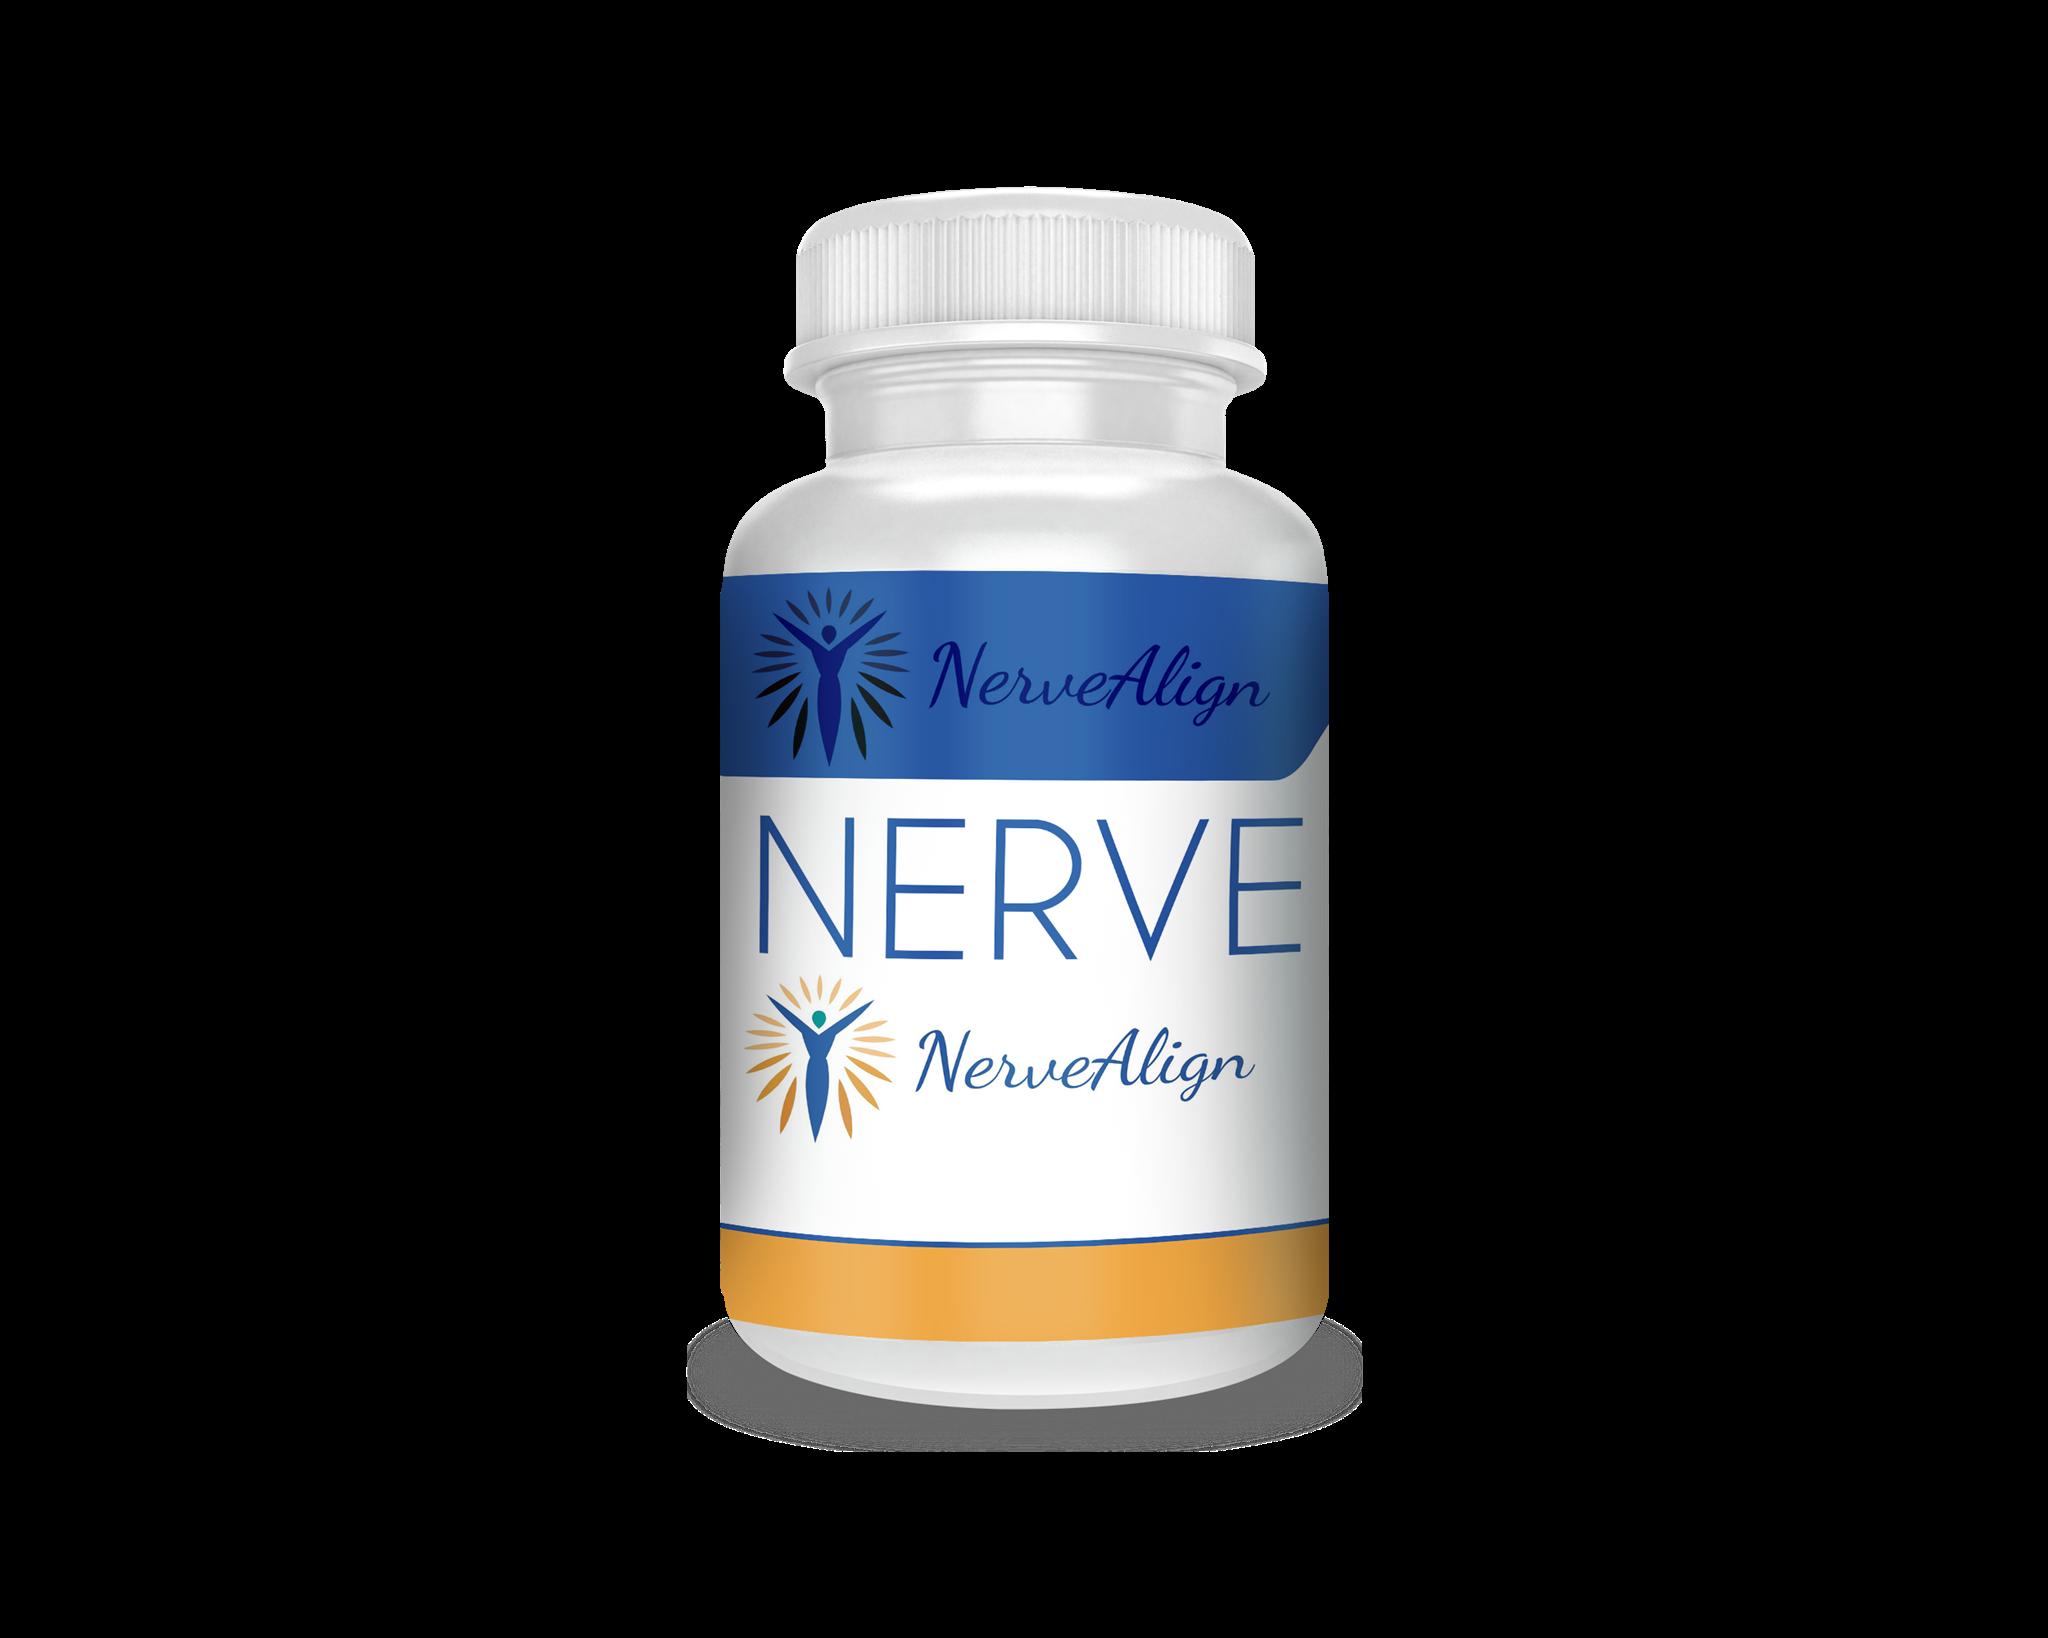 Nerve Align Supplement Review